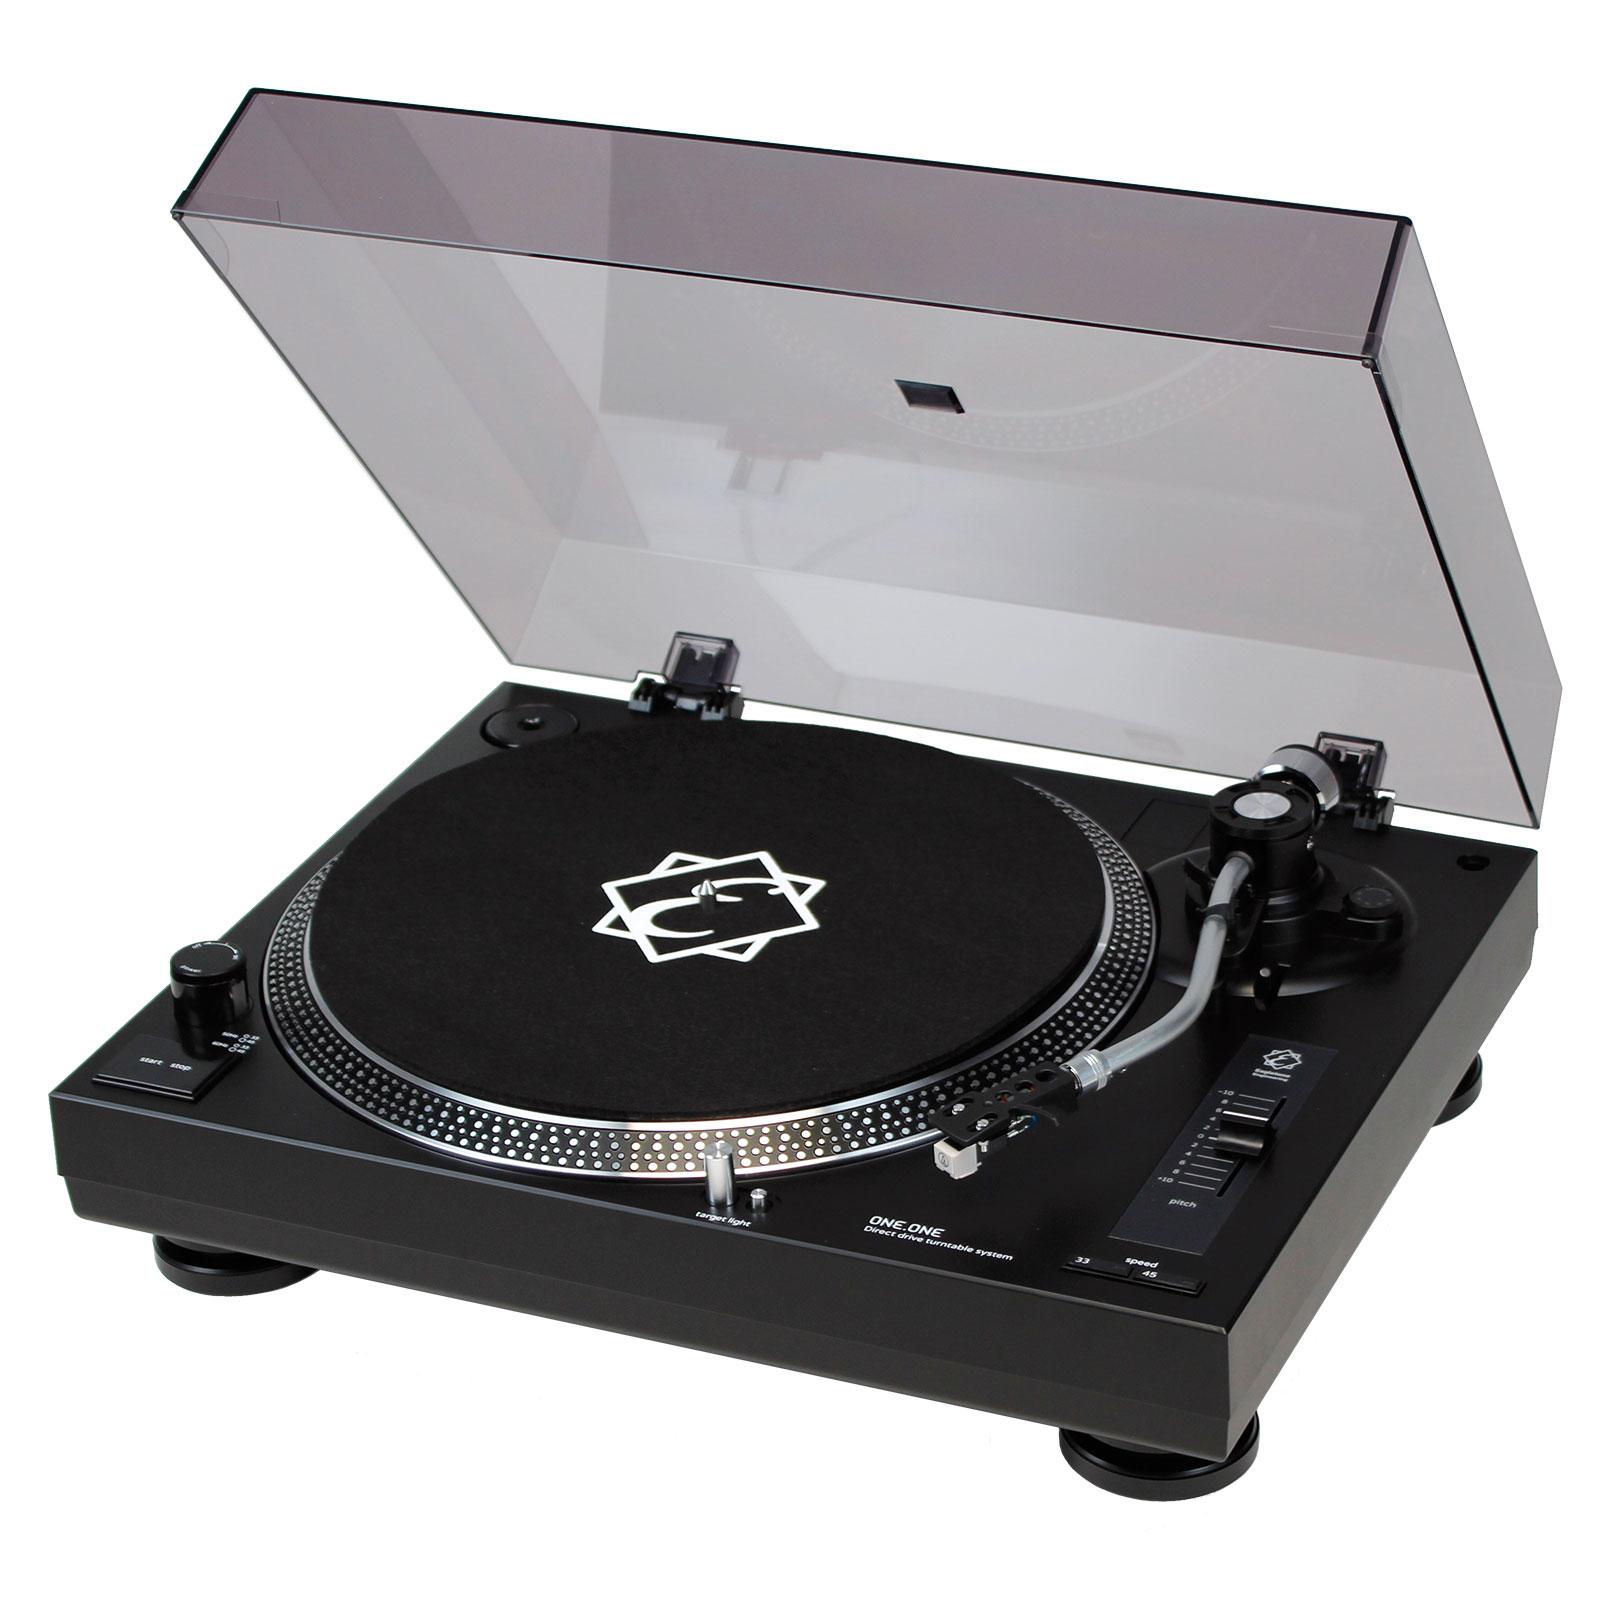 dj tech vinyl usb 10 v2 platine vinyle usb noire mk2 noel dj tools buy online free. Black Bedroom Furniture Sets. Home Design Ideas